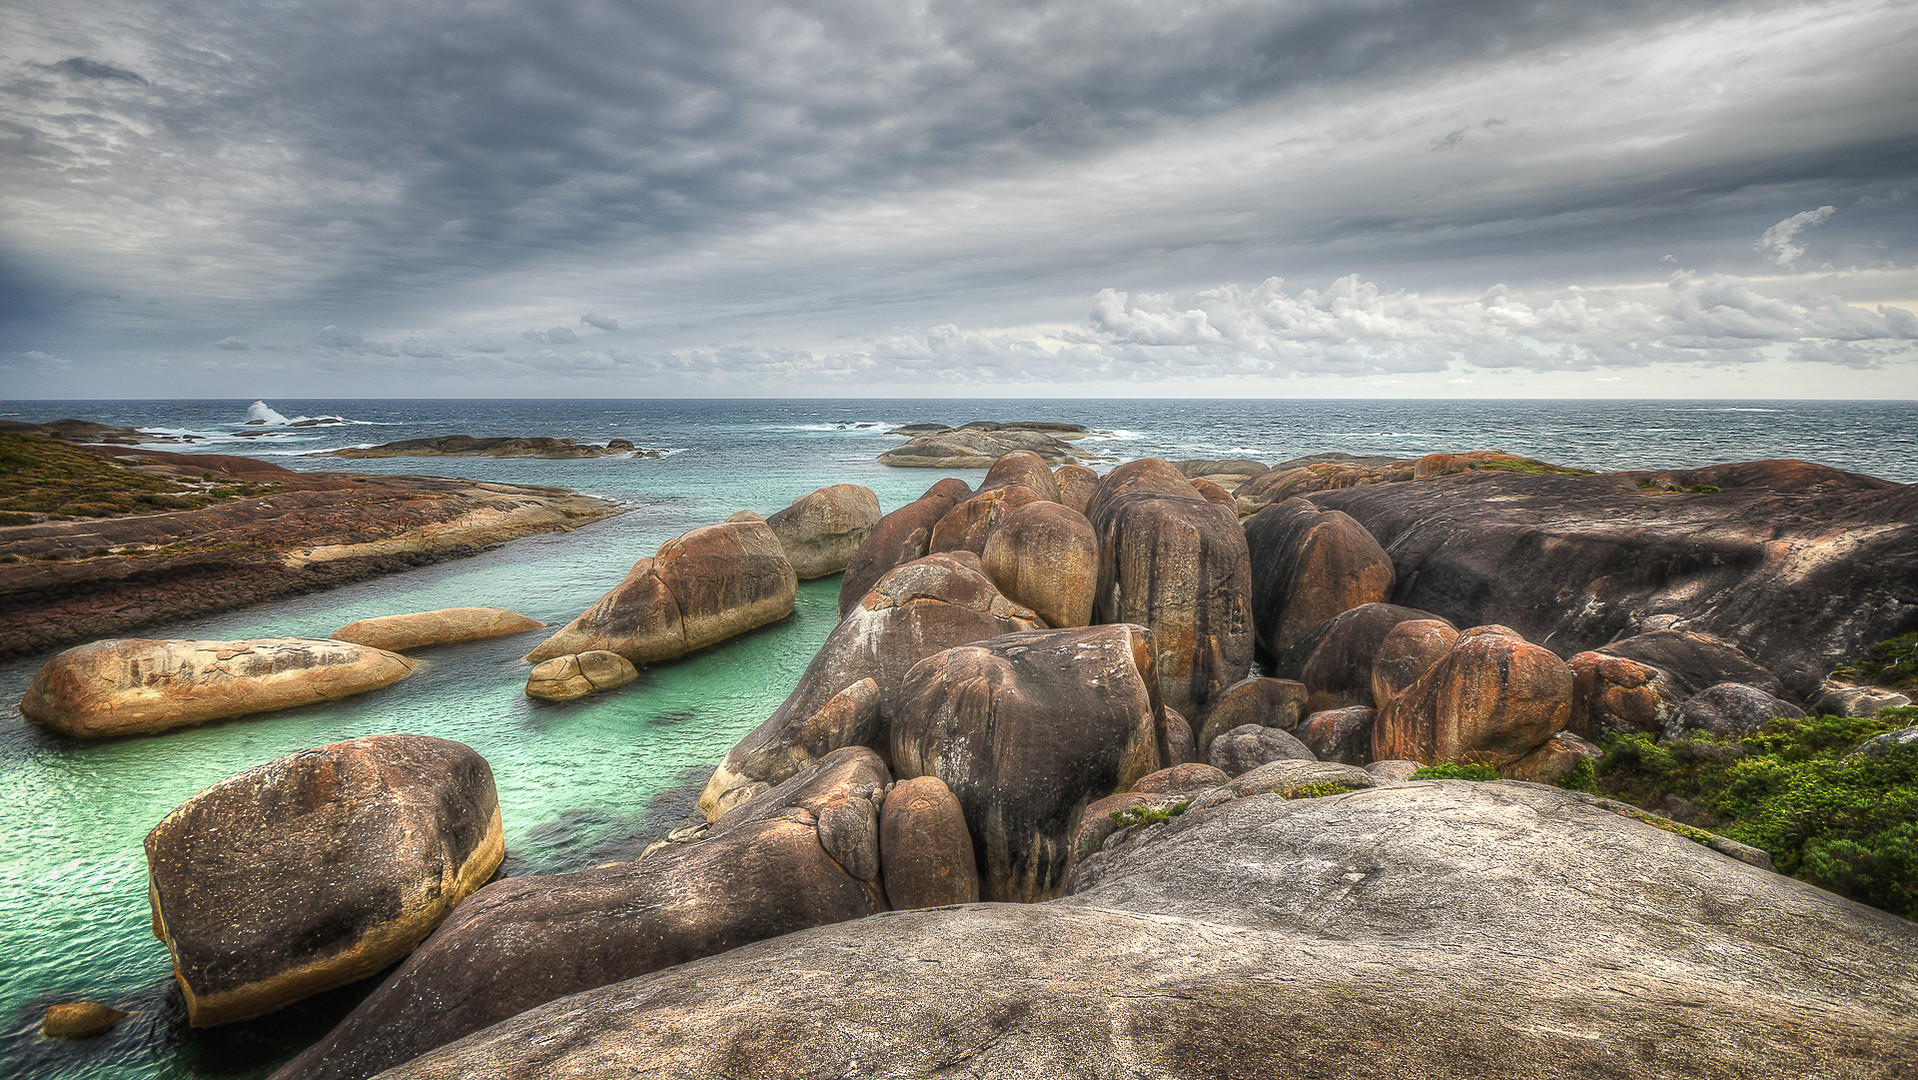 *Elephant Rocks*